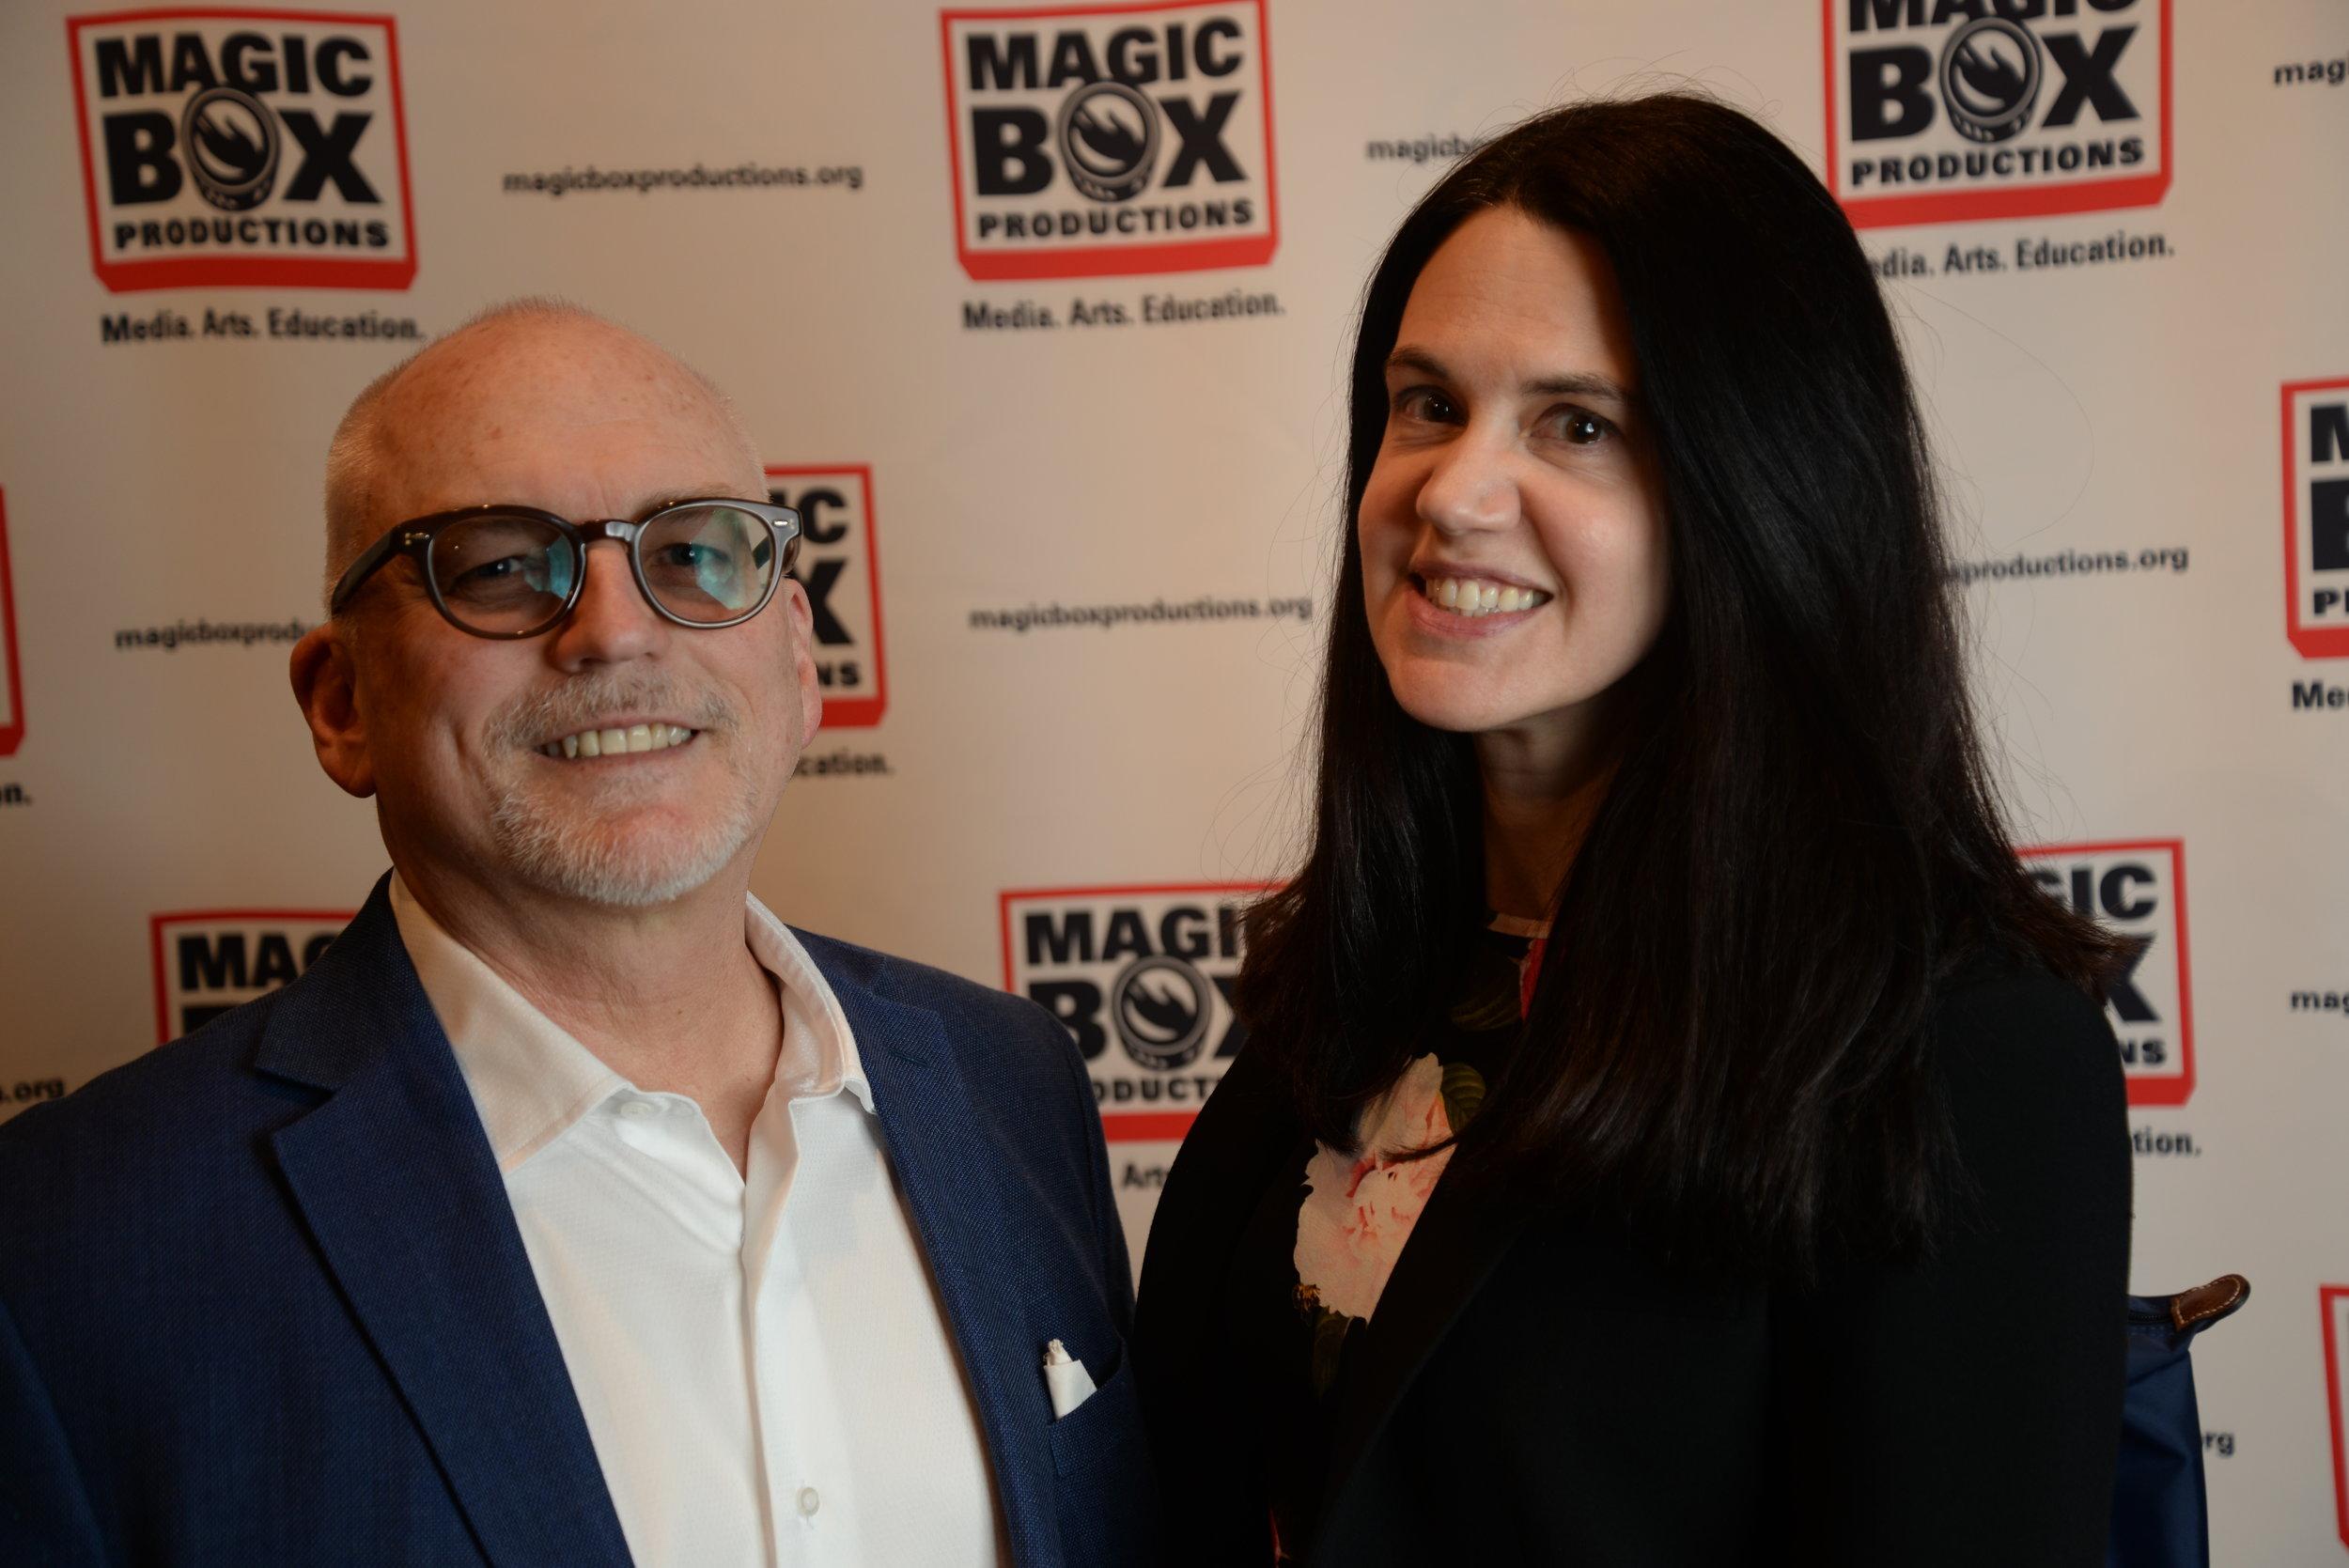 Stuart Vance & Lisa Erbach